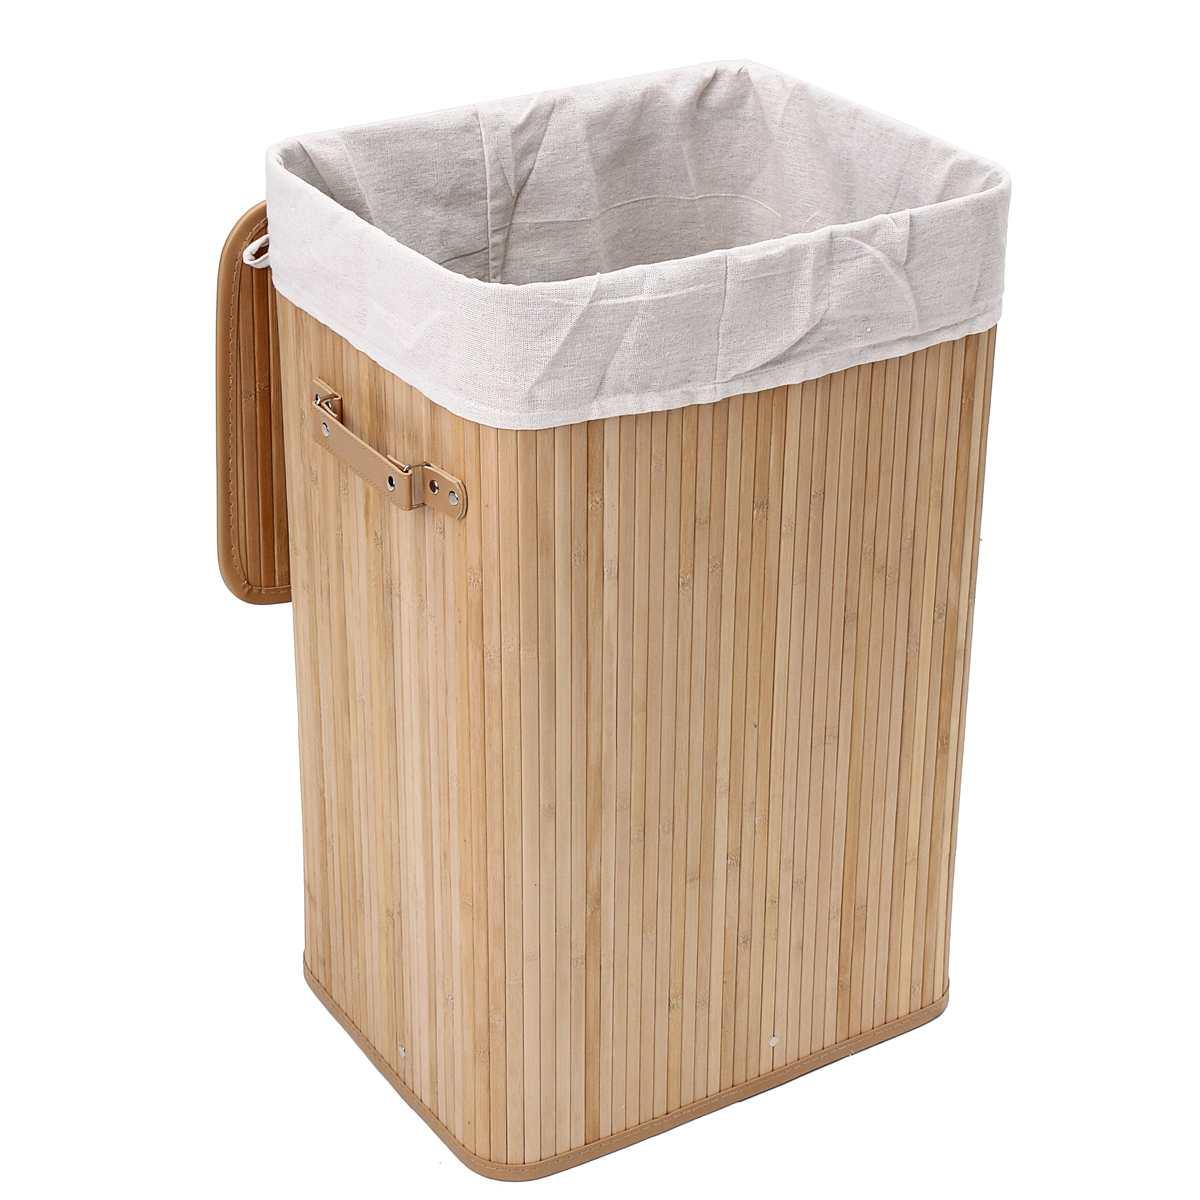 Bamboo Laundry Hamper Basket Wicker Clothes Storage Bag Sorter Bin Organizer Lid Washing Cloth Bin Rangier Lid